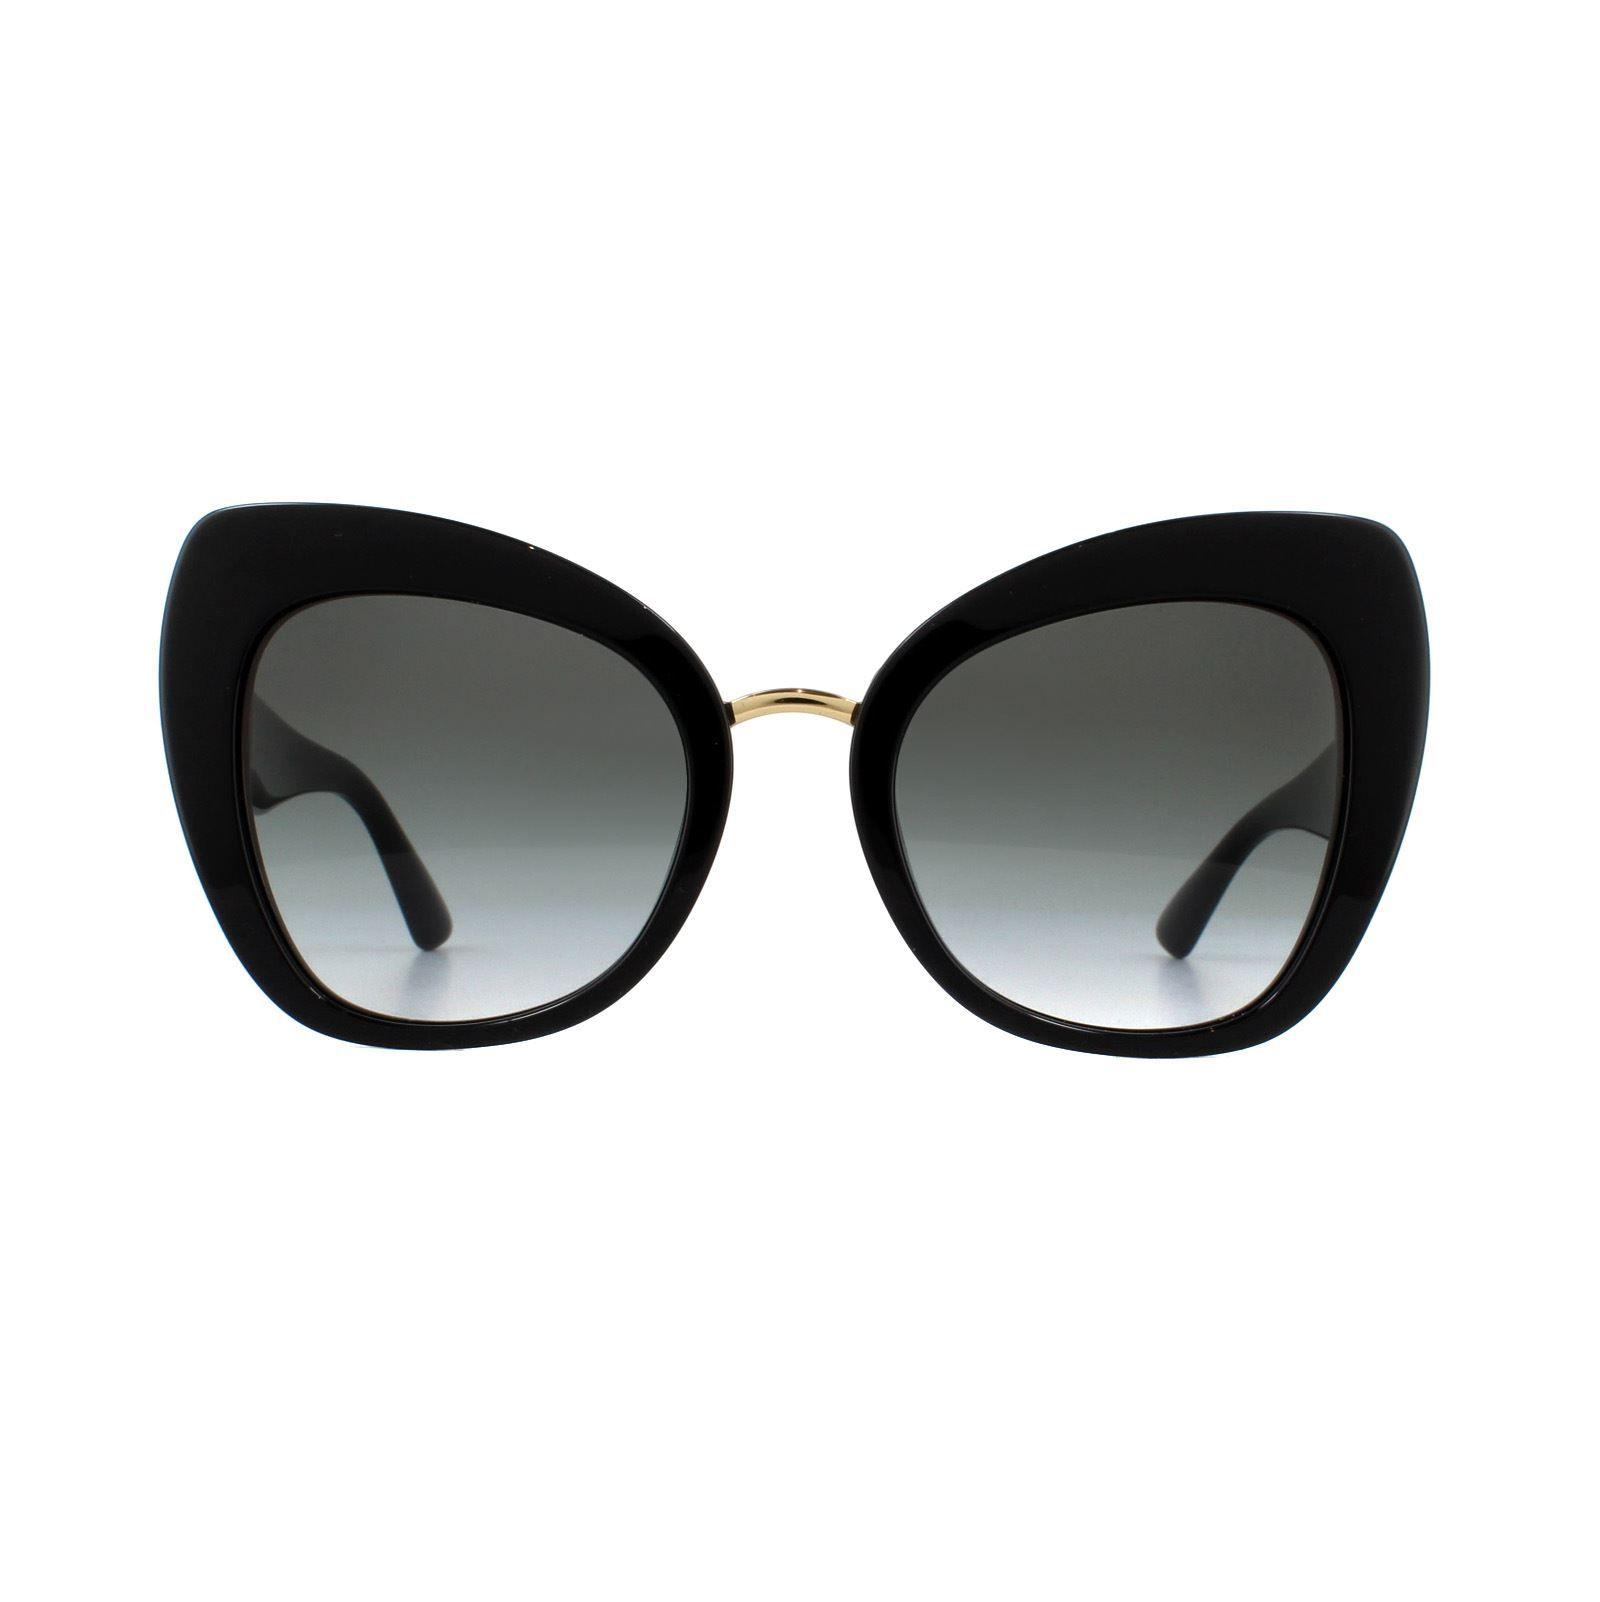 Dolce & Gabbana Sunglasses DG4319 501/8G Black Grey Gradient